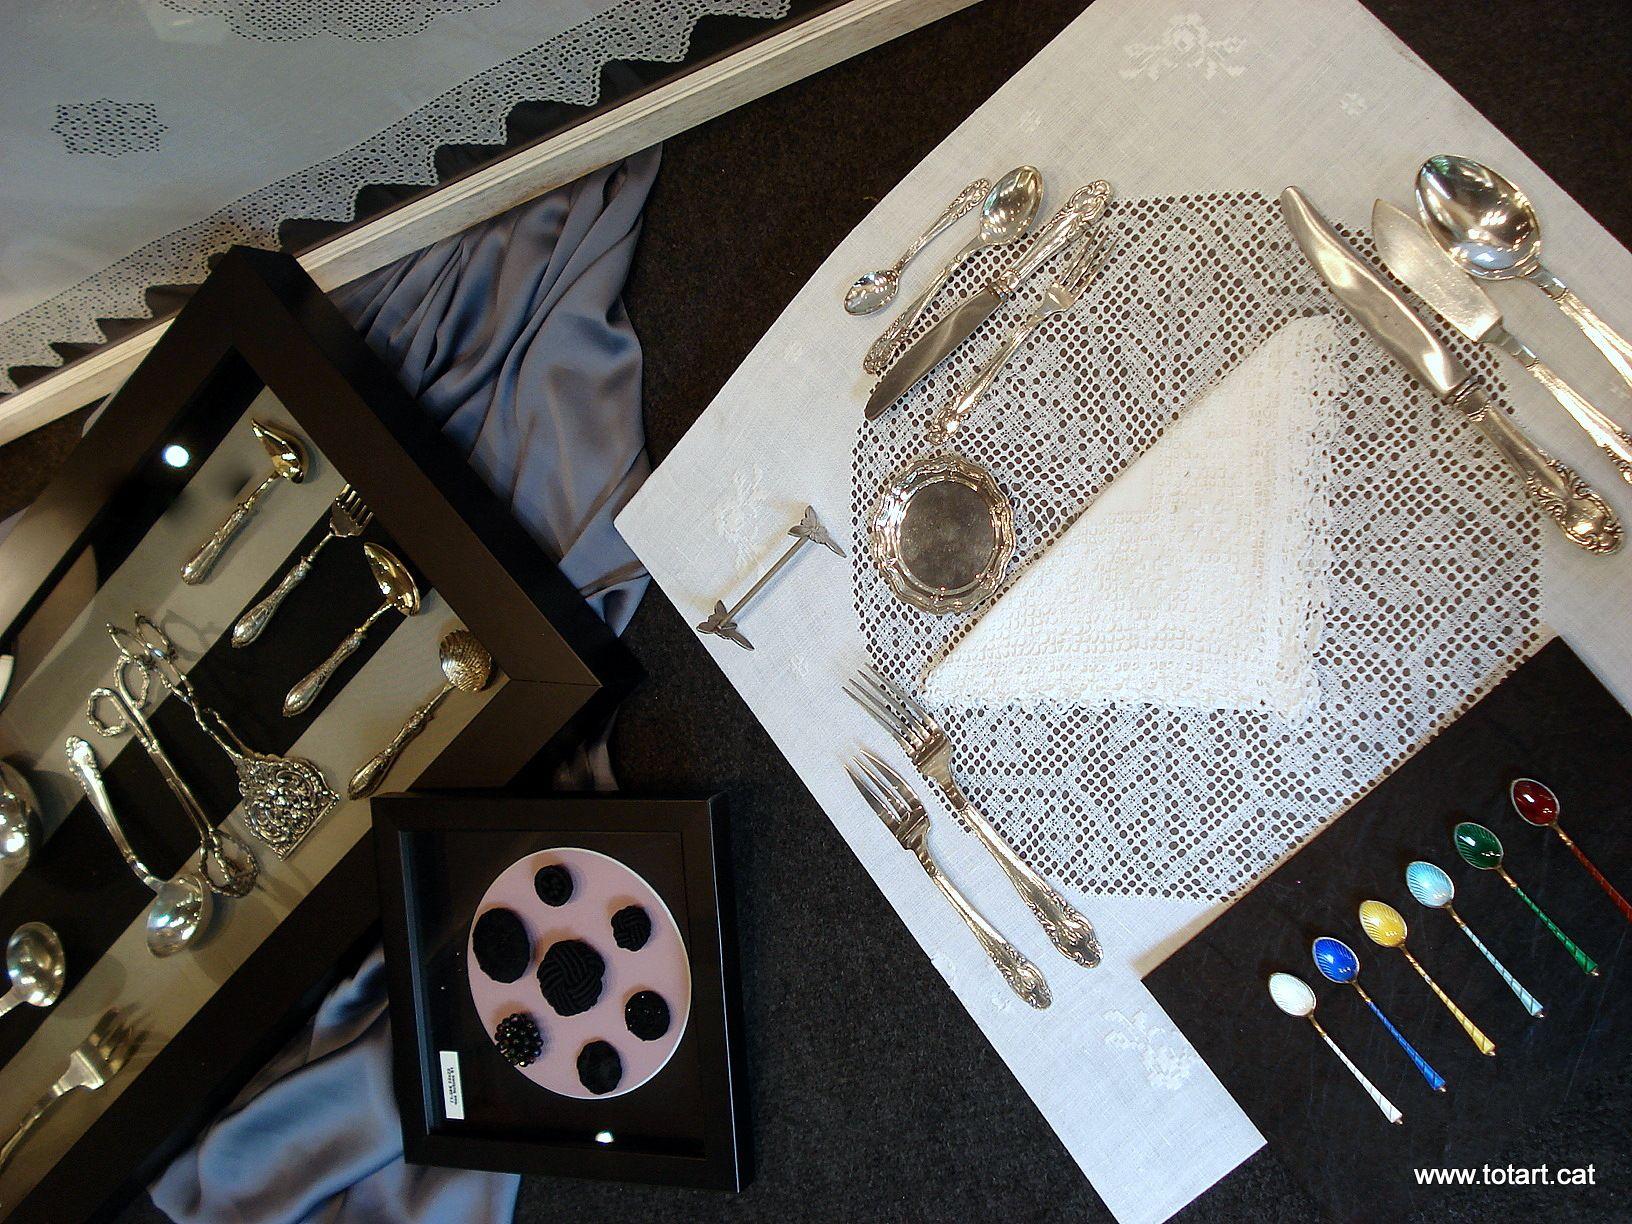 Marcos para cubiertos, manteles, botones, cucharas..te damos ideas ...